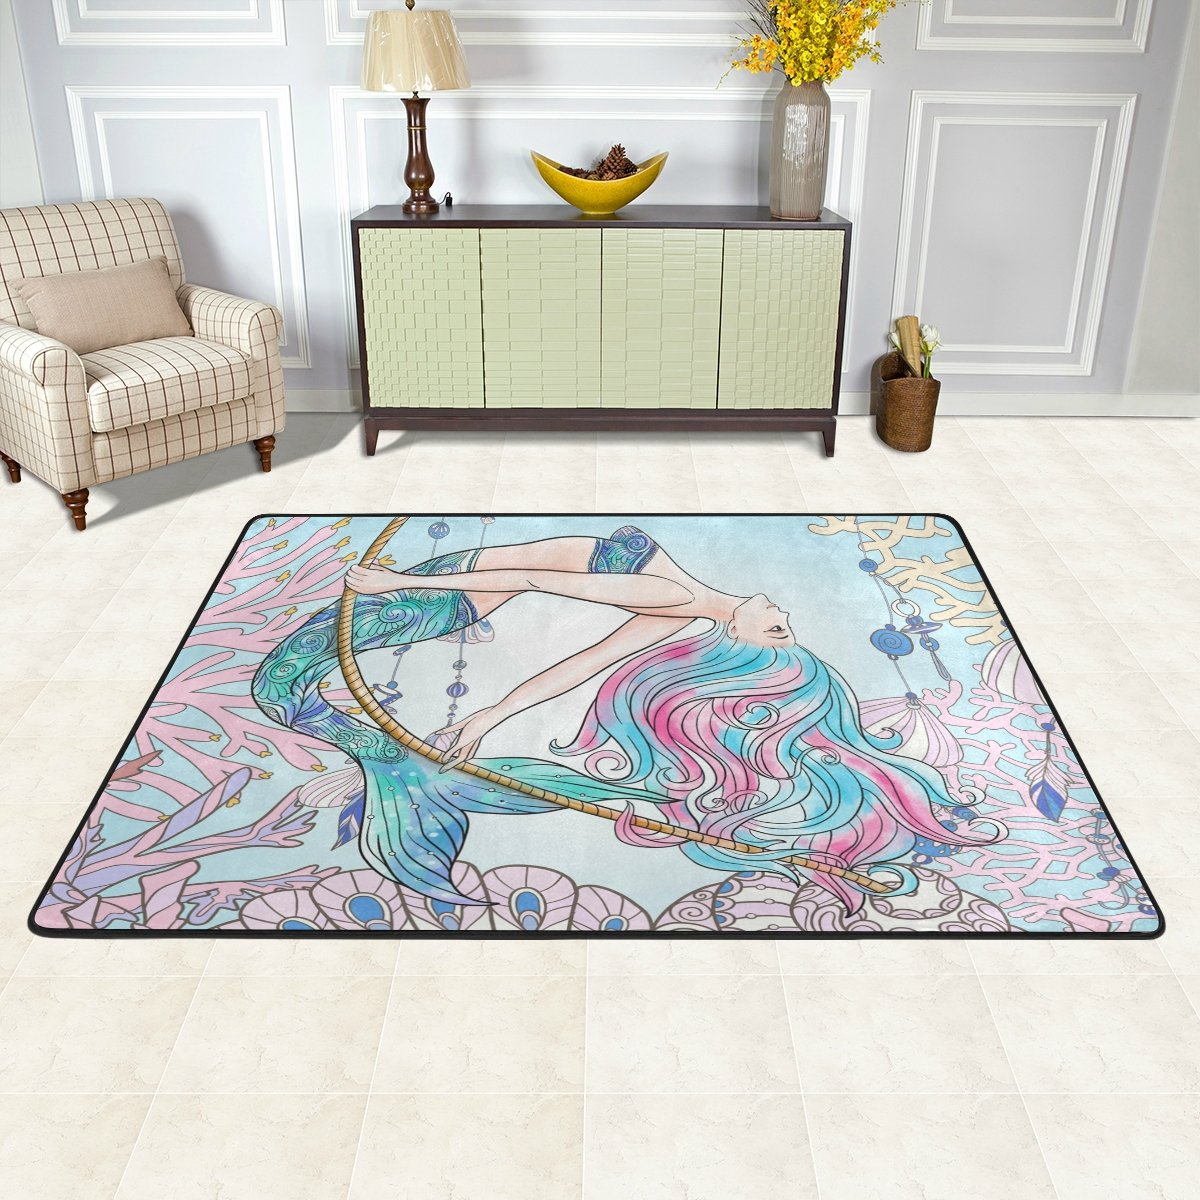 Ocean Animal Nursery Rug Floor Carpet Yoga Mat 1.7 x 2.6 ft Naanle Cartoon Mermaid Non Slip Area Rug for Living Dinning Room Bedroom Kitchen 50 x 80 cm